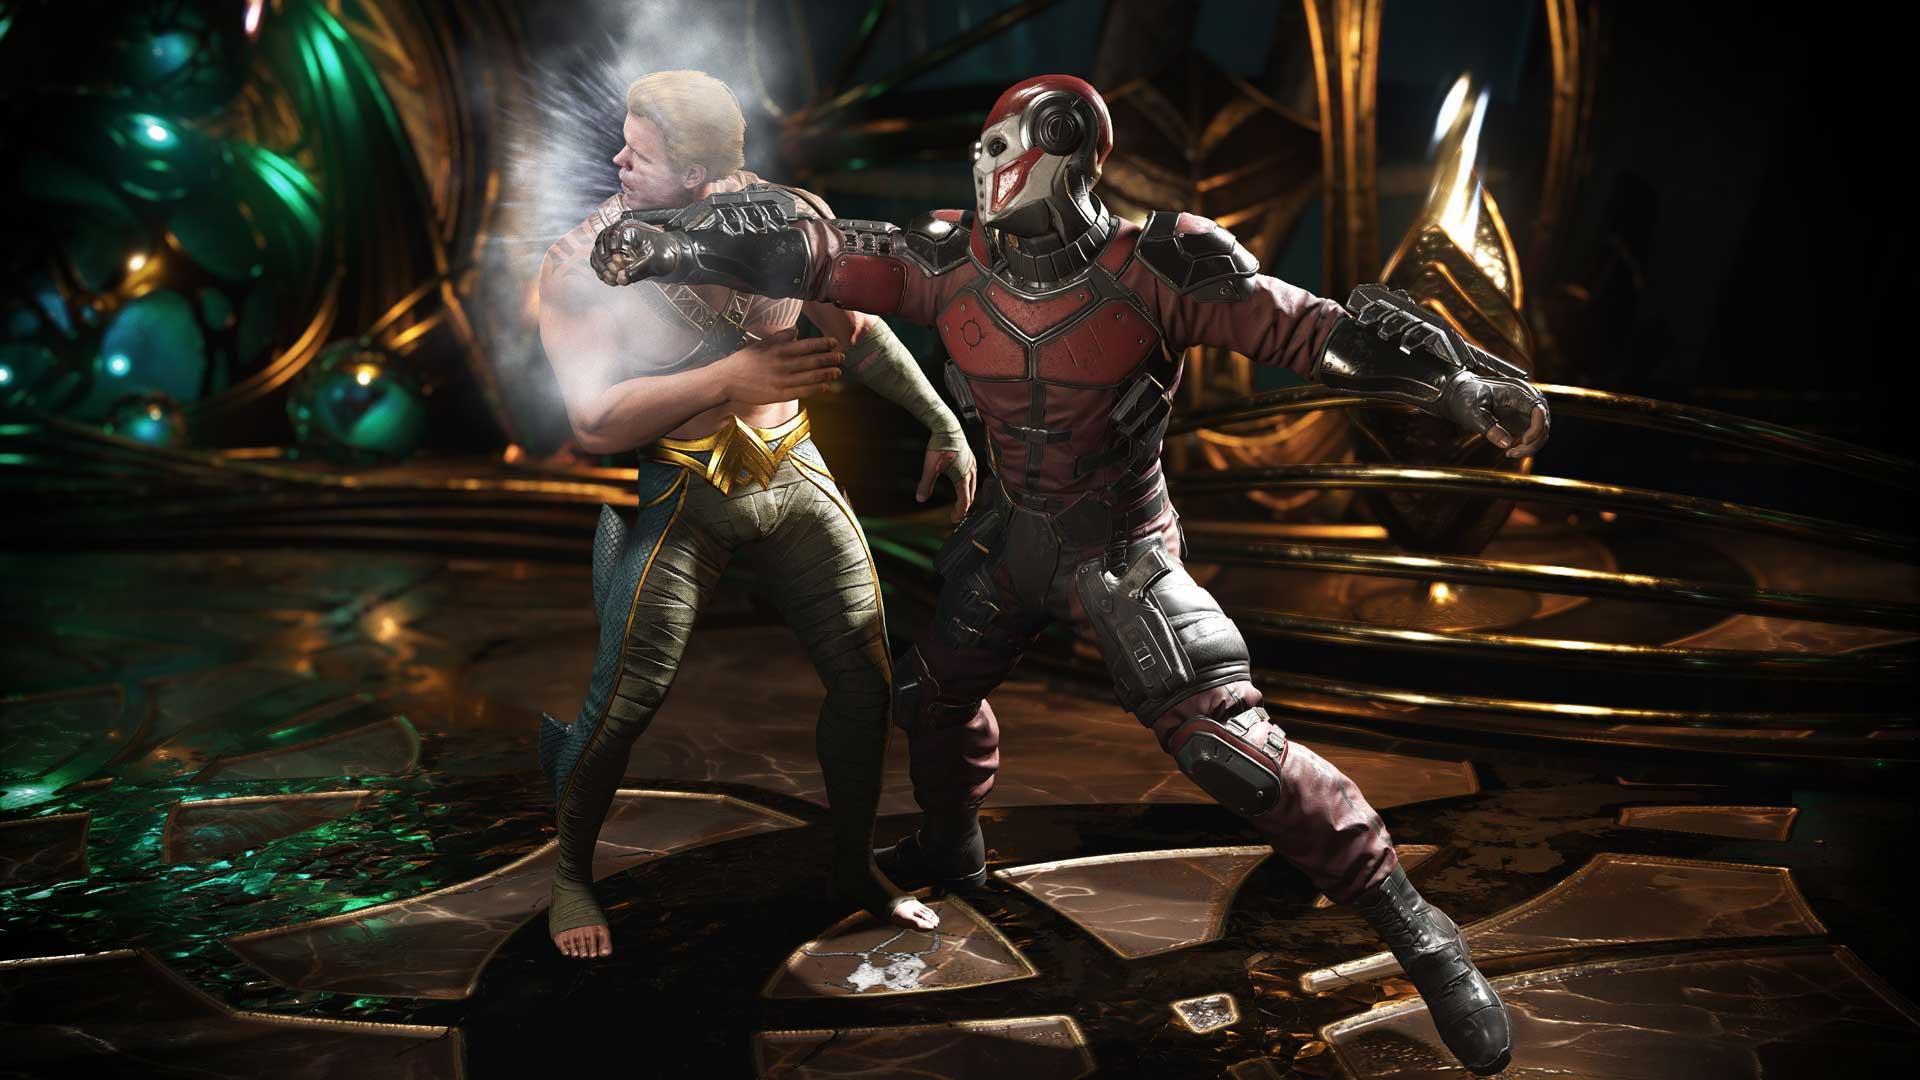 Скриншот Injustice 2: Legendary Edition (2017) PC